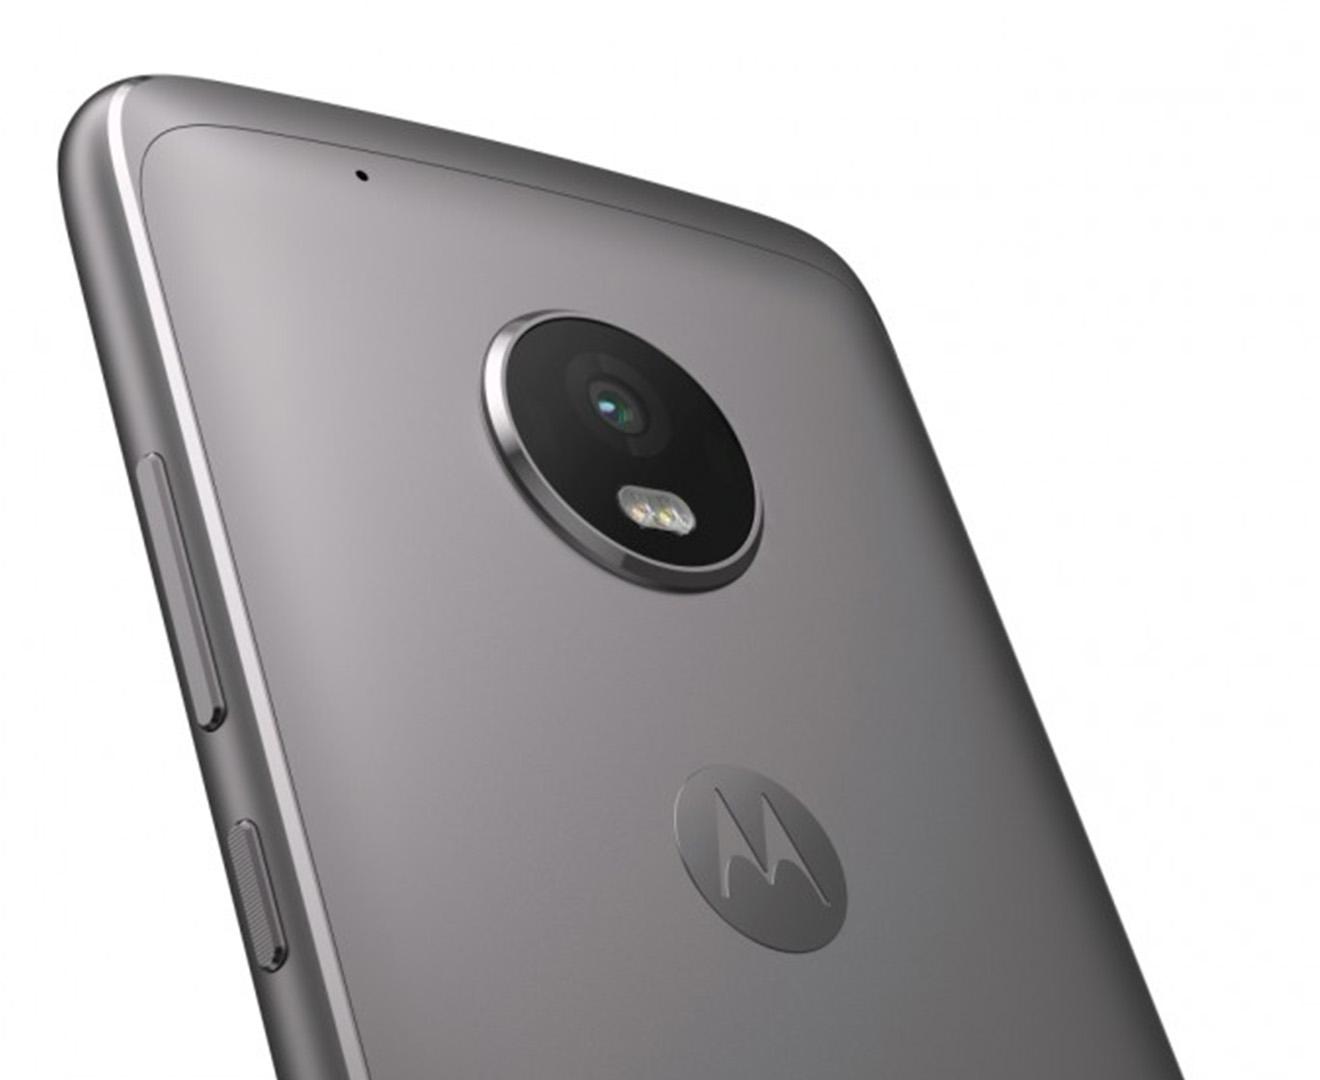 355e26c1e4f111 Motorola Moto G5 Plus 16GB XT1685 - Lunar Grey